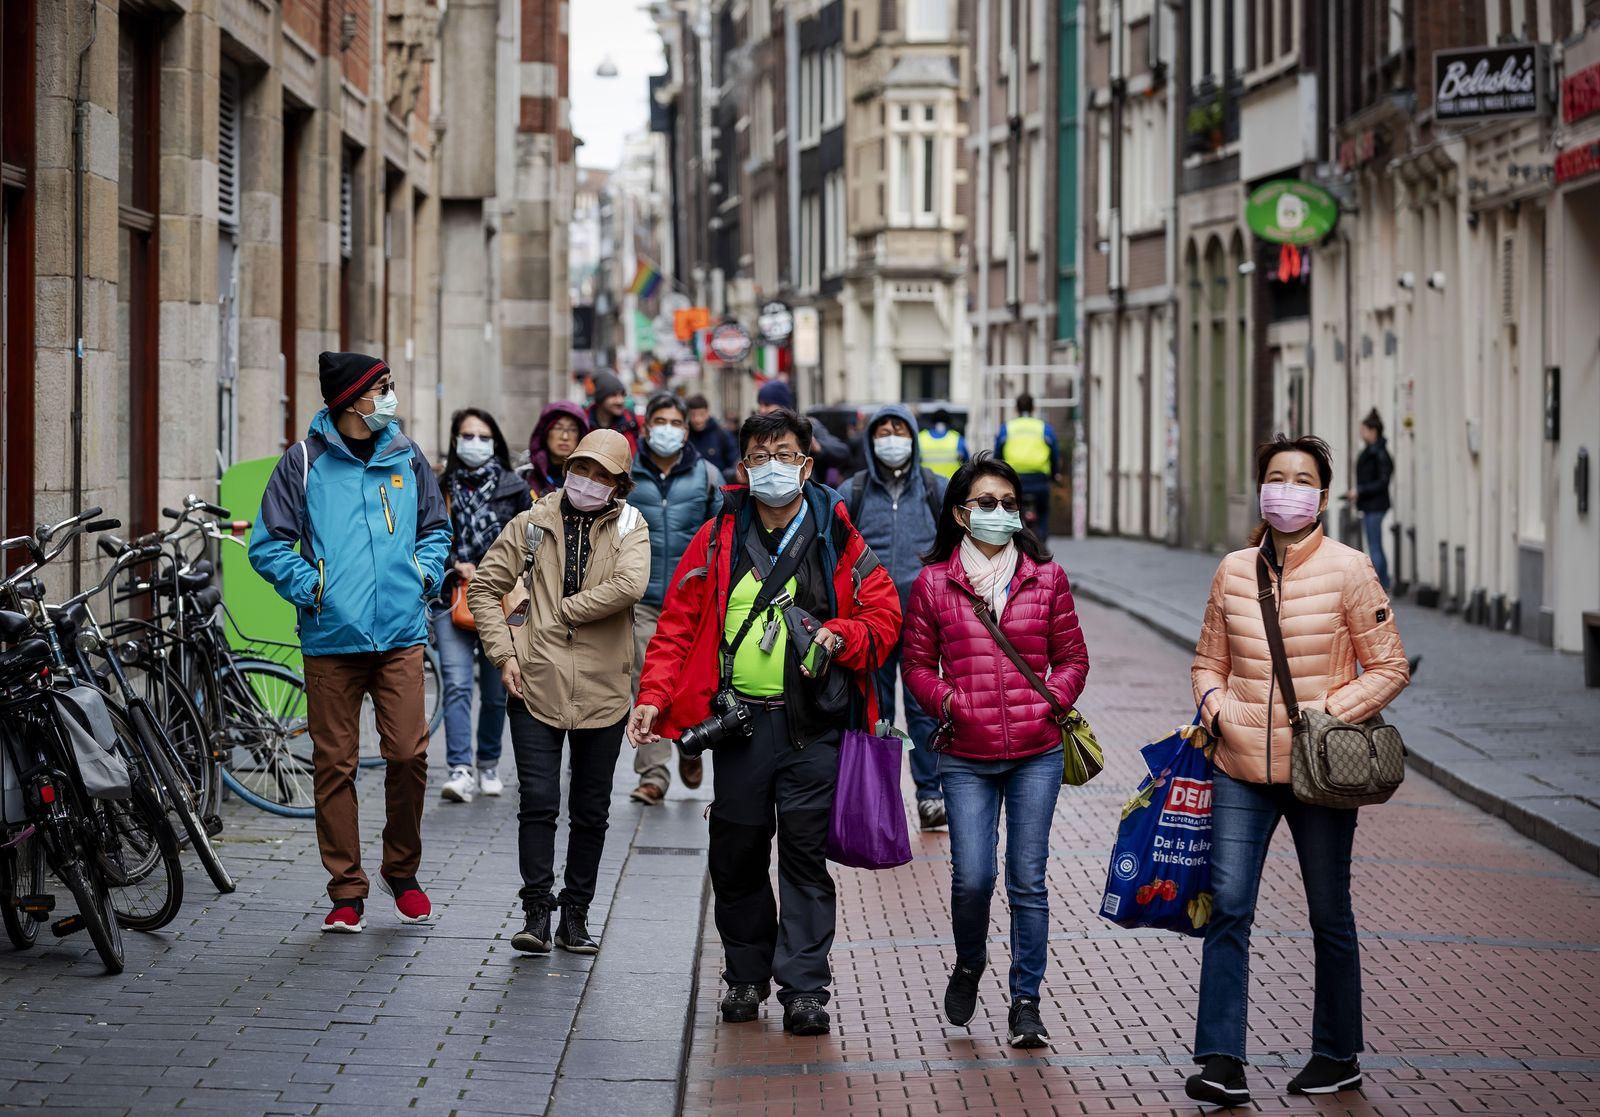 NETHERLANDS-HEALTH-VIRUS